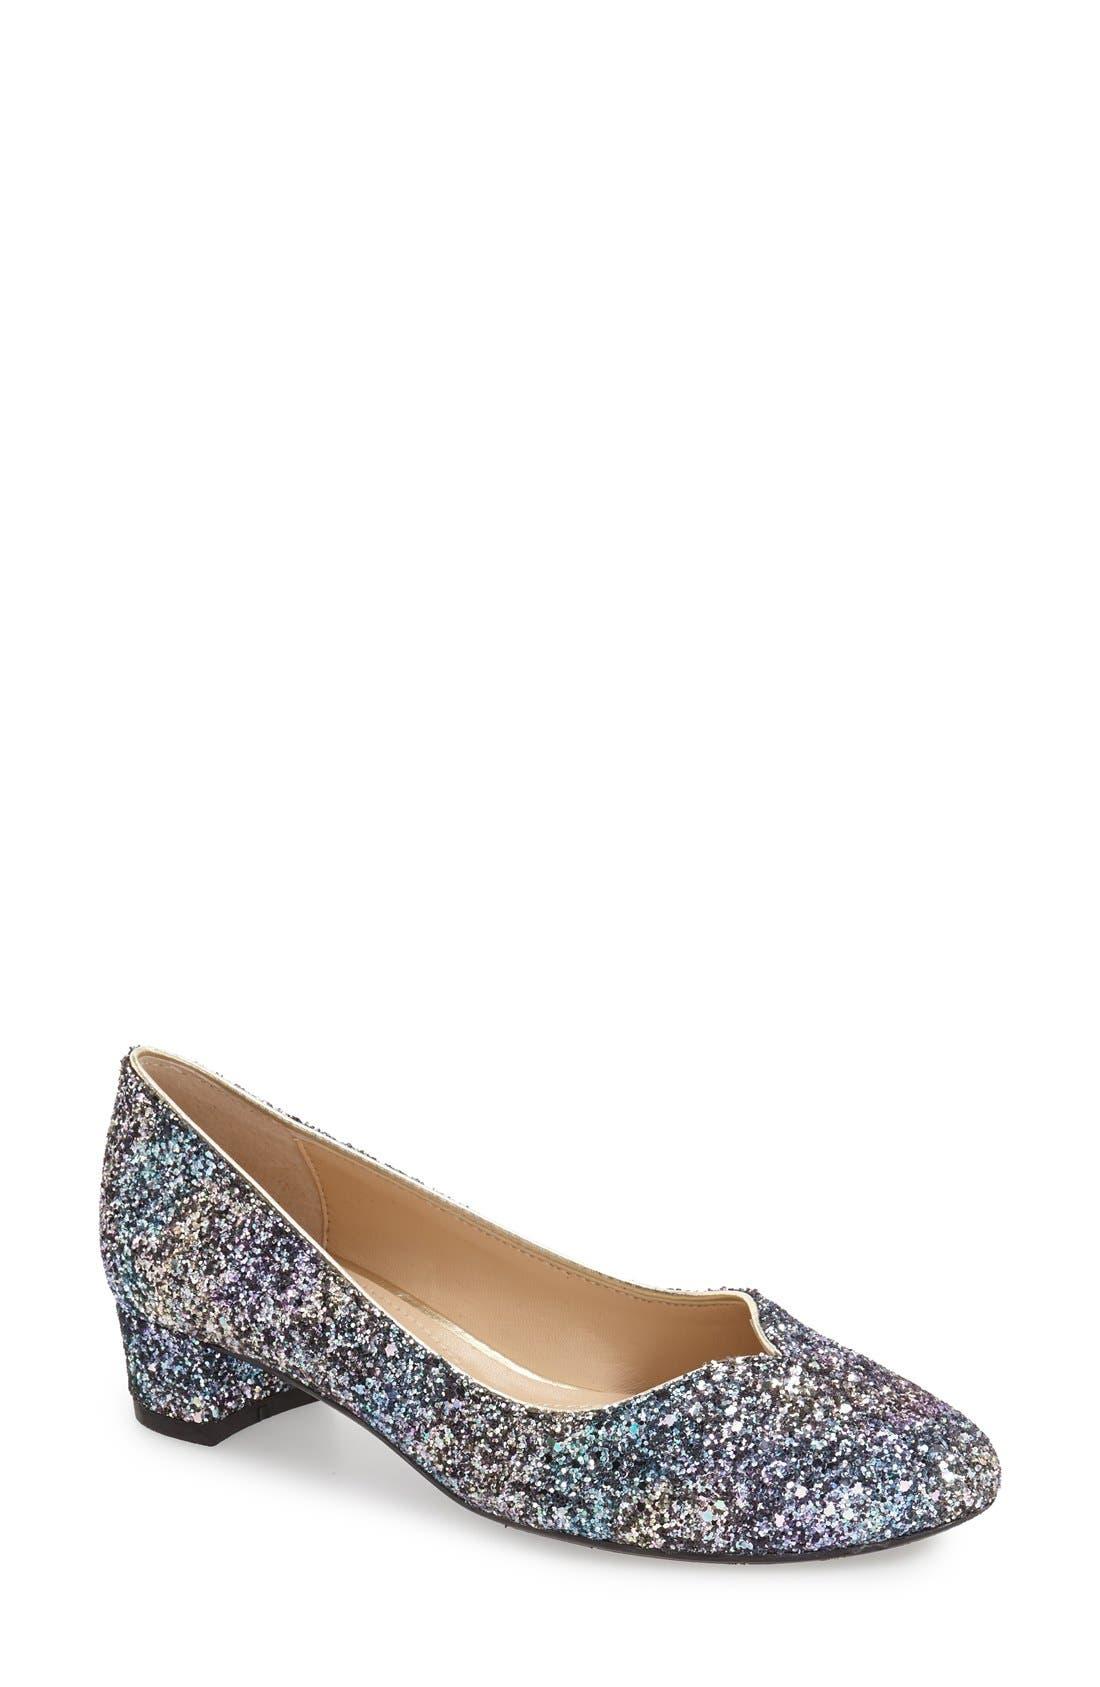 'Bambalina' Block Heel Glitter Pump,                             Main thumbnail 1, color,                             Blue/ Gold Glitter Fabric